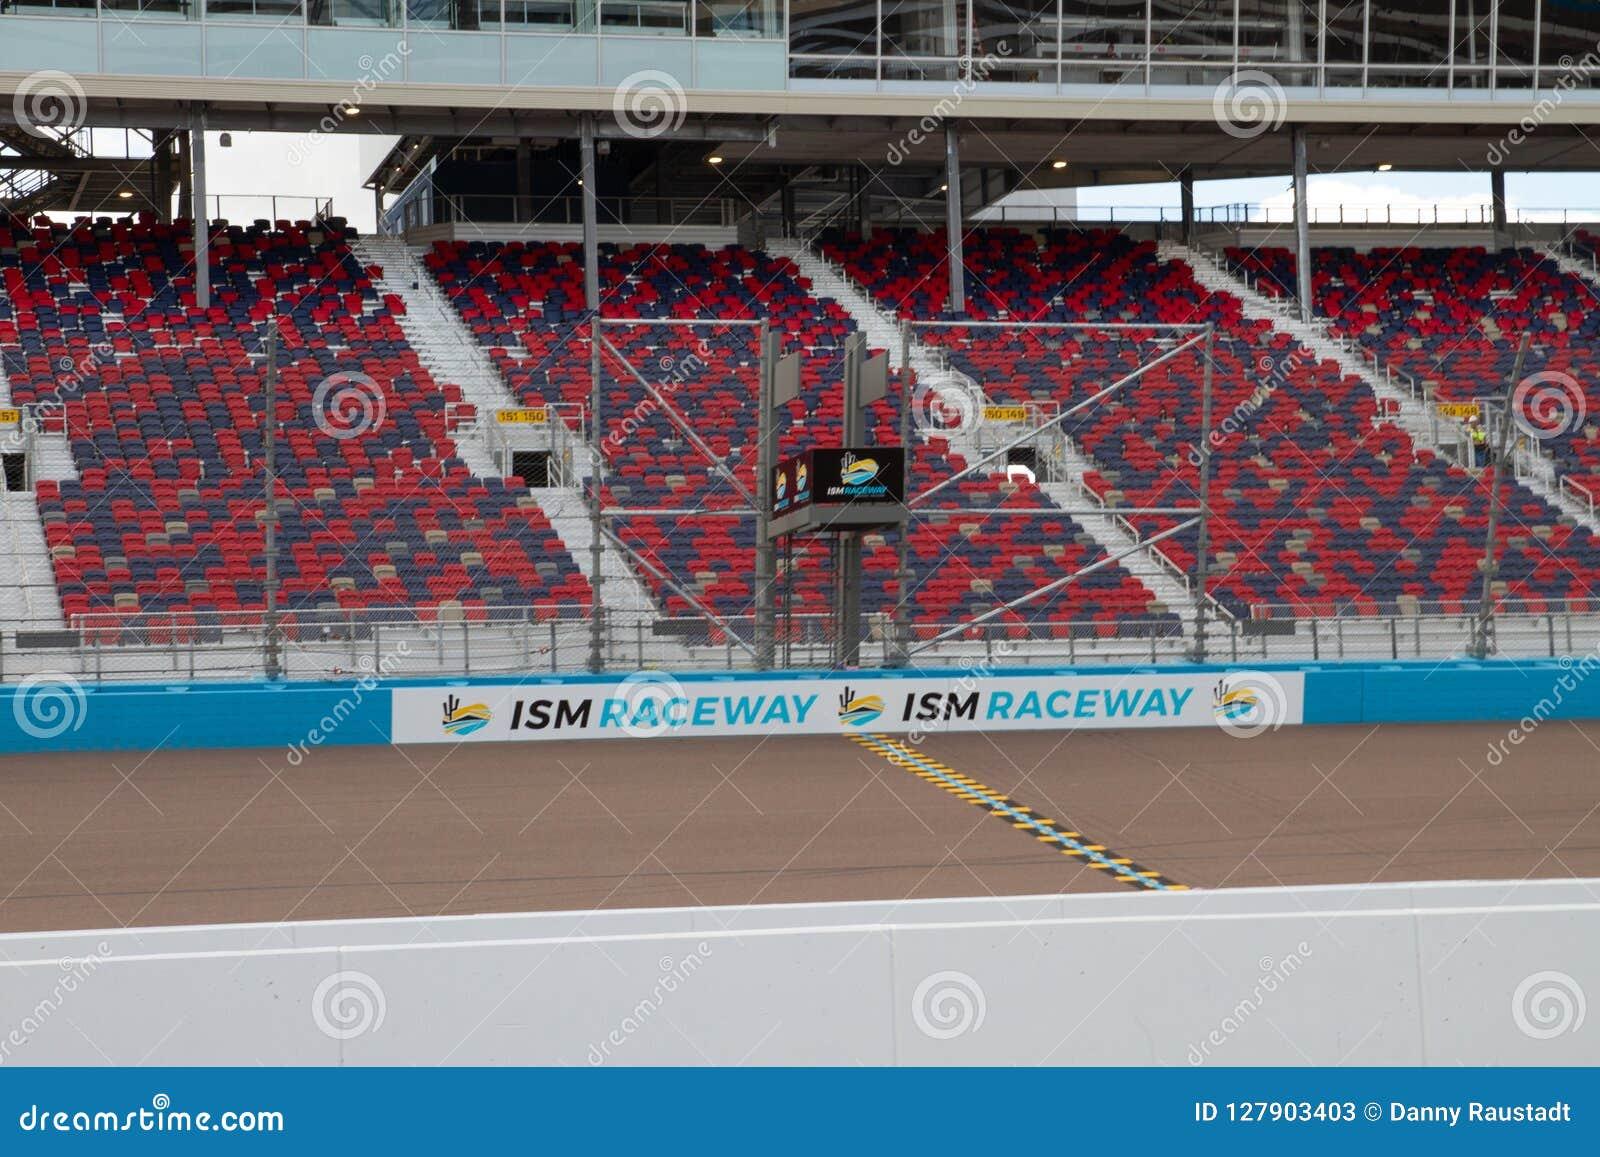 Canal adutor do ISMO - Phoenix Nascar e IndyCar